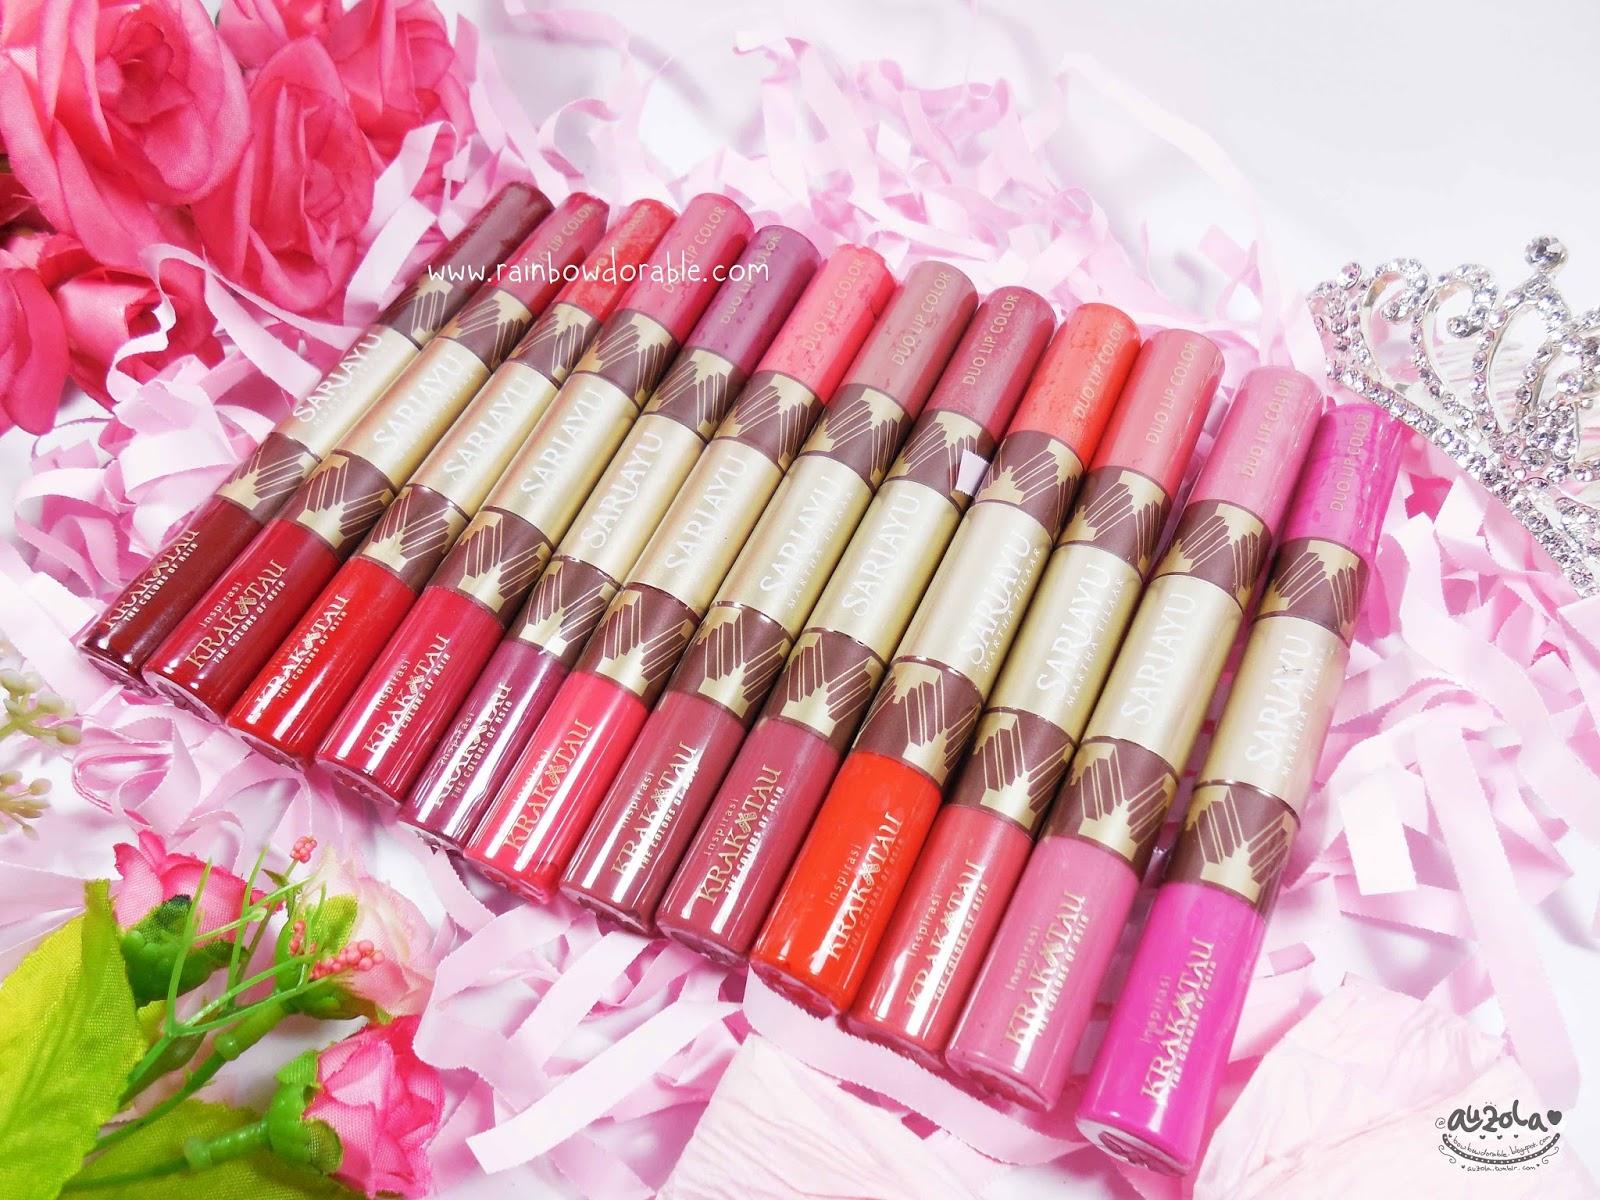 Sariayu Color Trend 16 Duo Lip Colo K 10 Daftar Harga Terkini Review